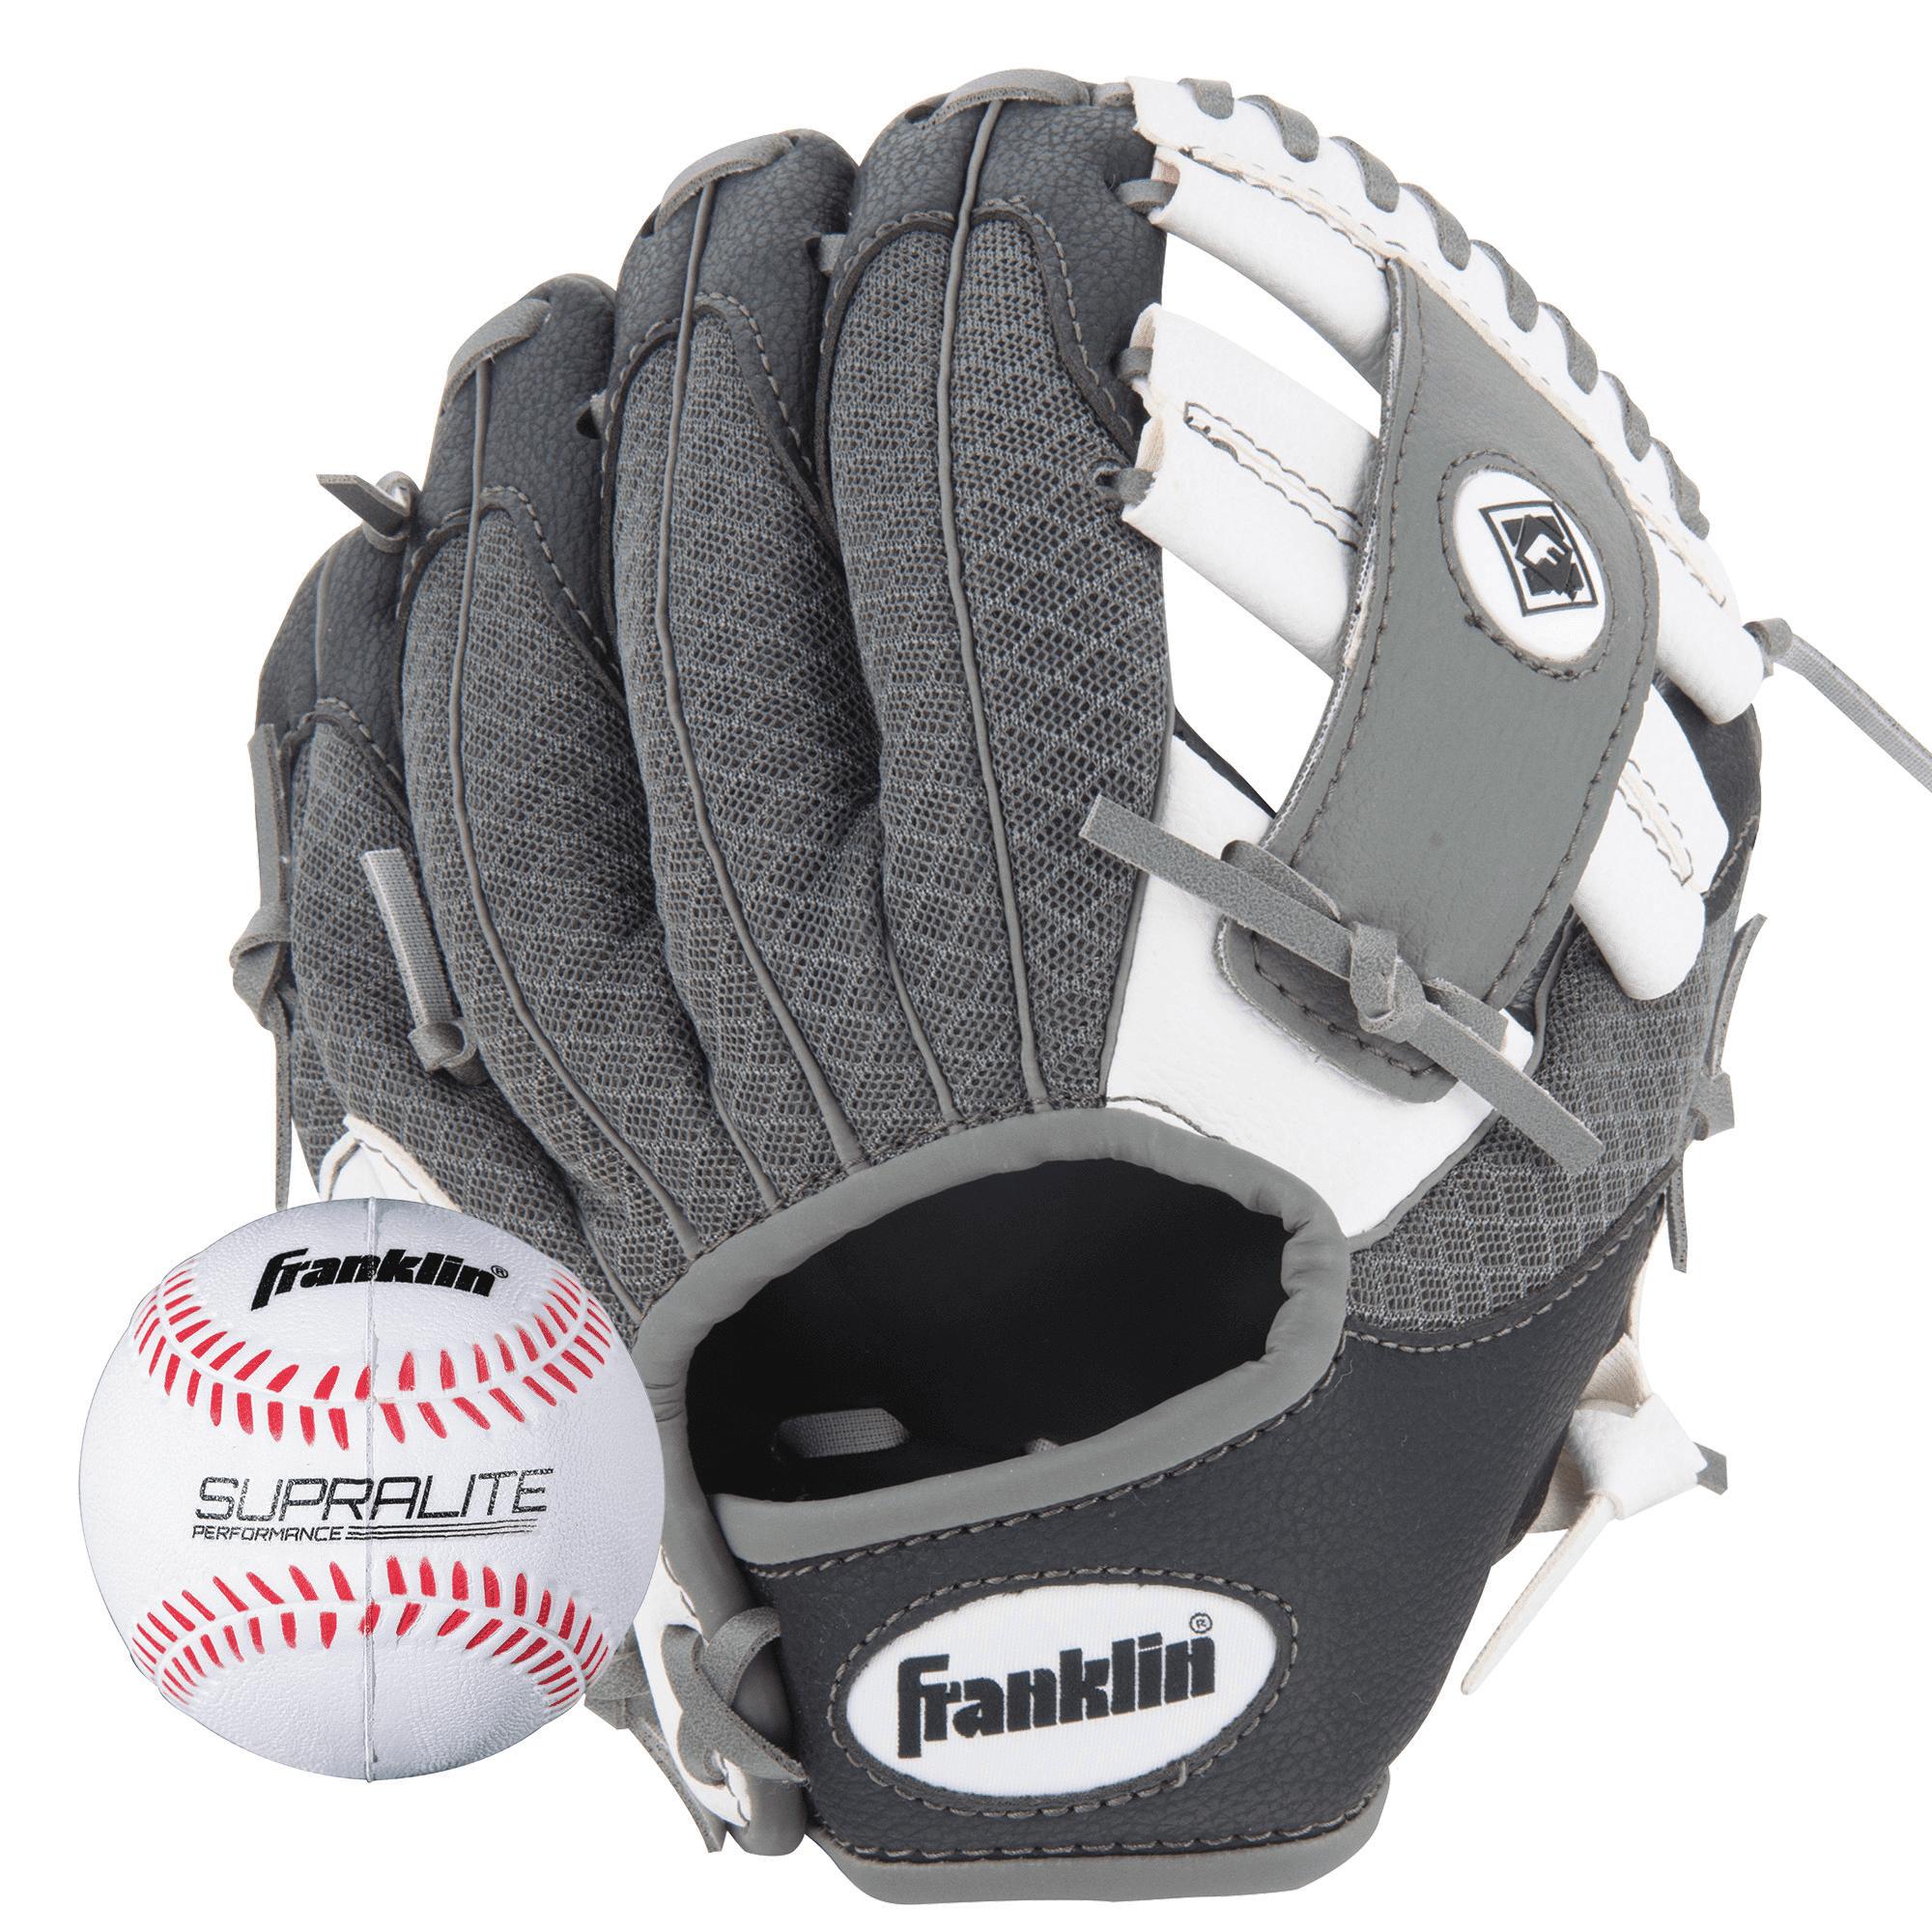 blau Graphite//Blue 10,5 10.5 Inches Franklin Sports Teeball Franklin Fielding Glove-Infinite Web